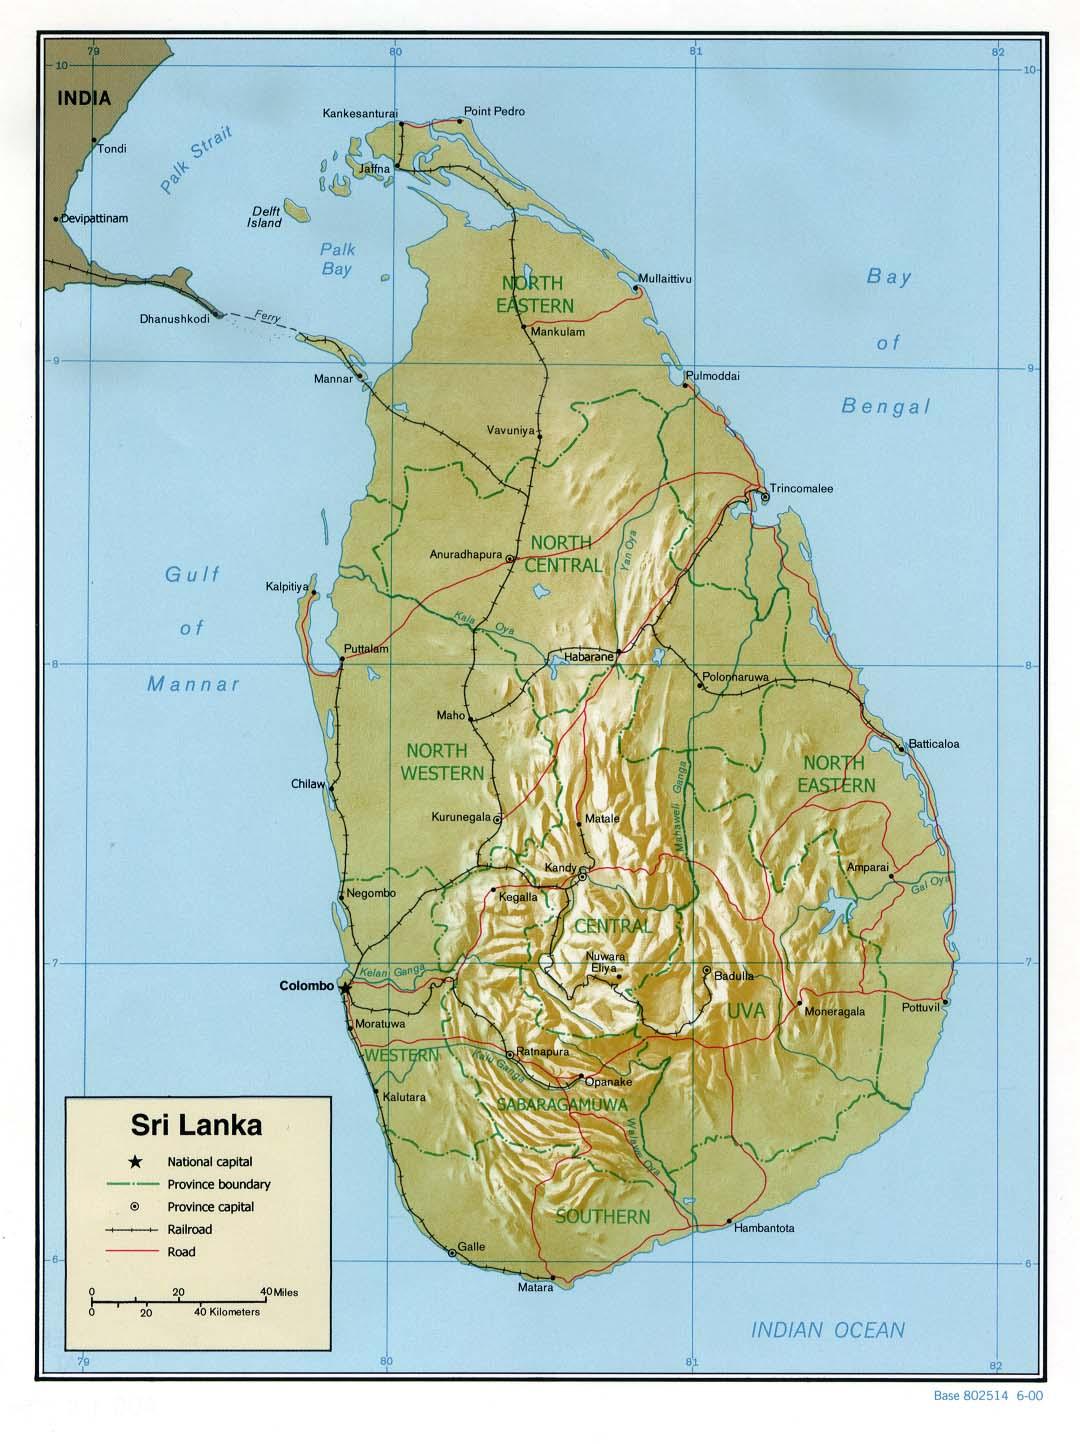 Sri Lanka Shaded Relief Map